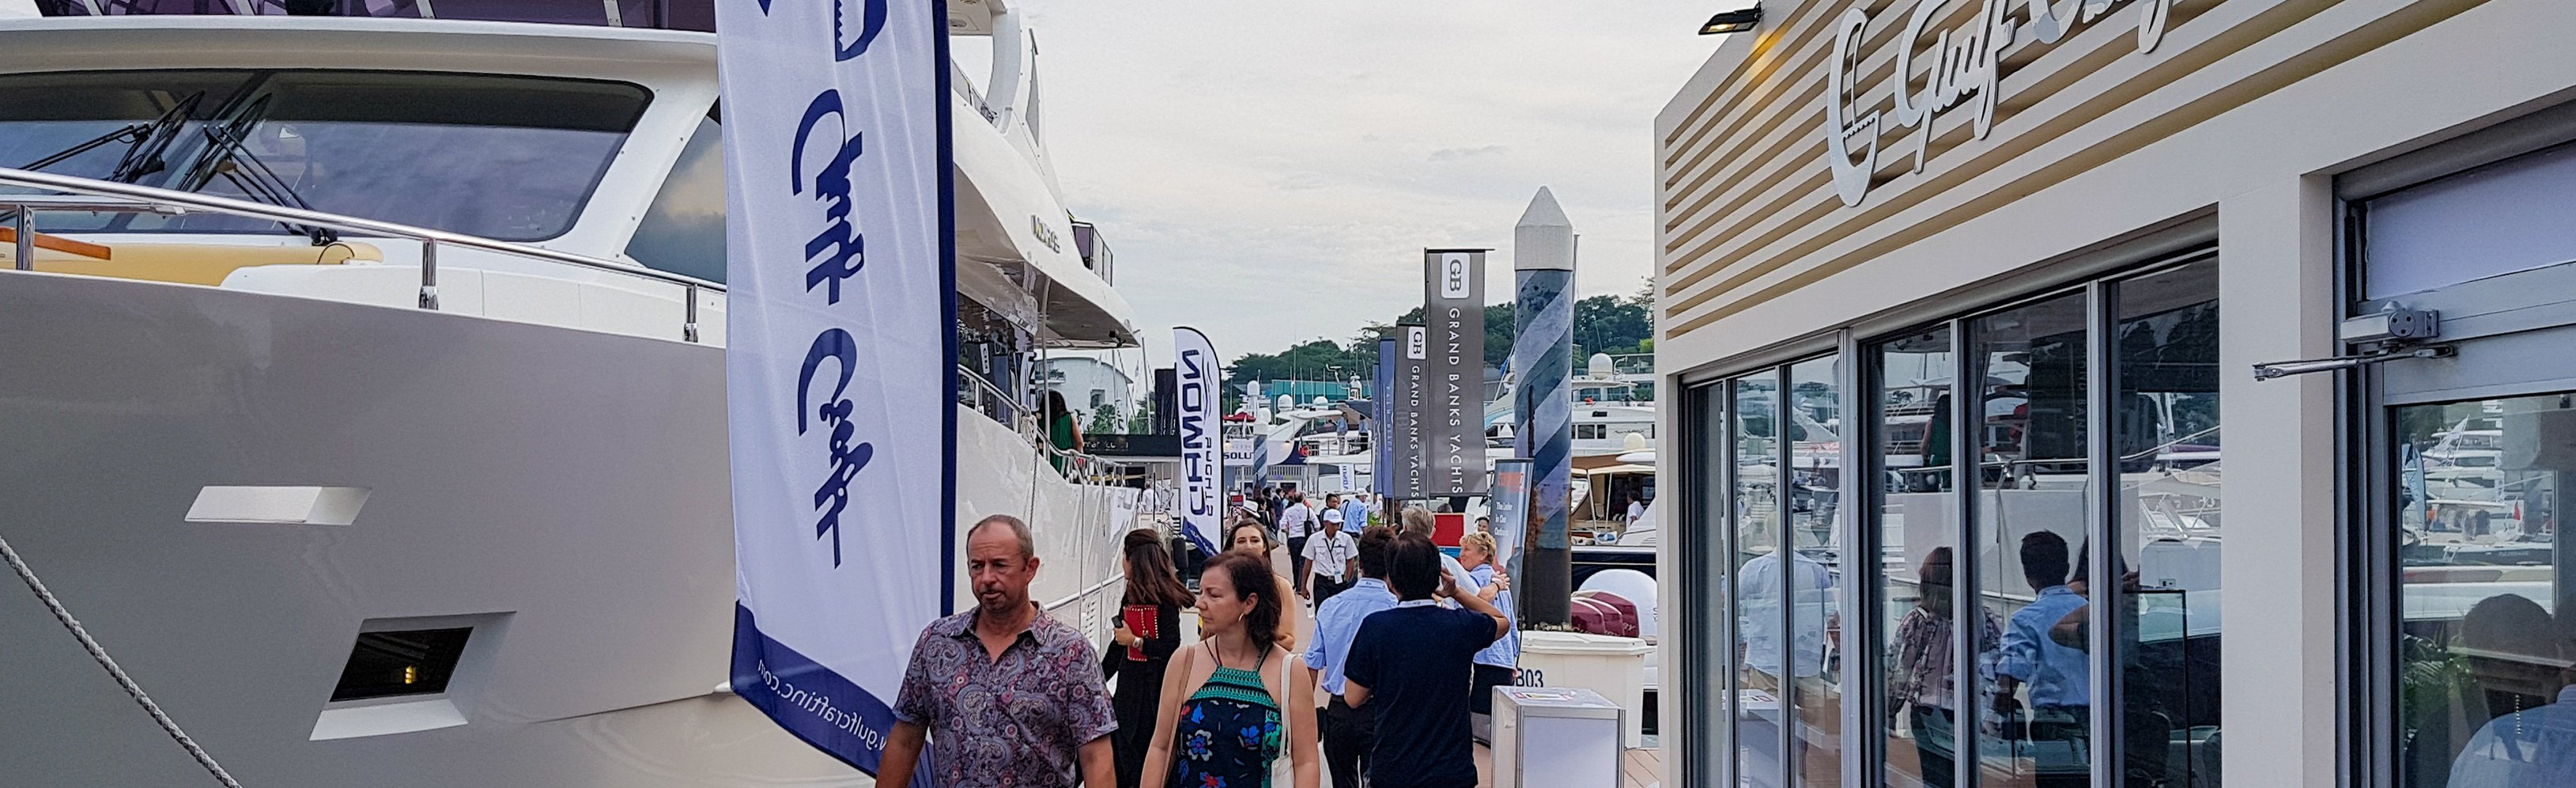 Singapore-Yacht-Show-2018,-Gulf-Craft